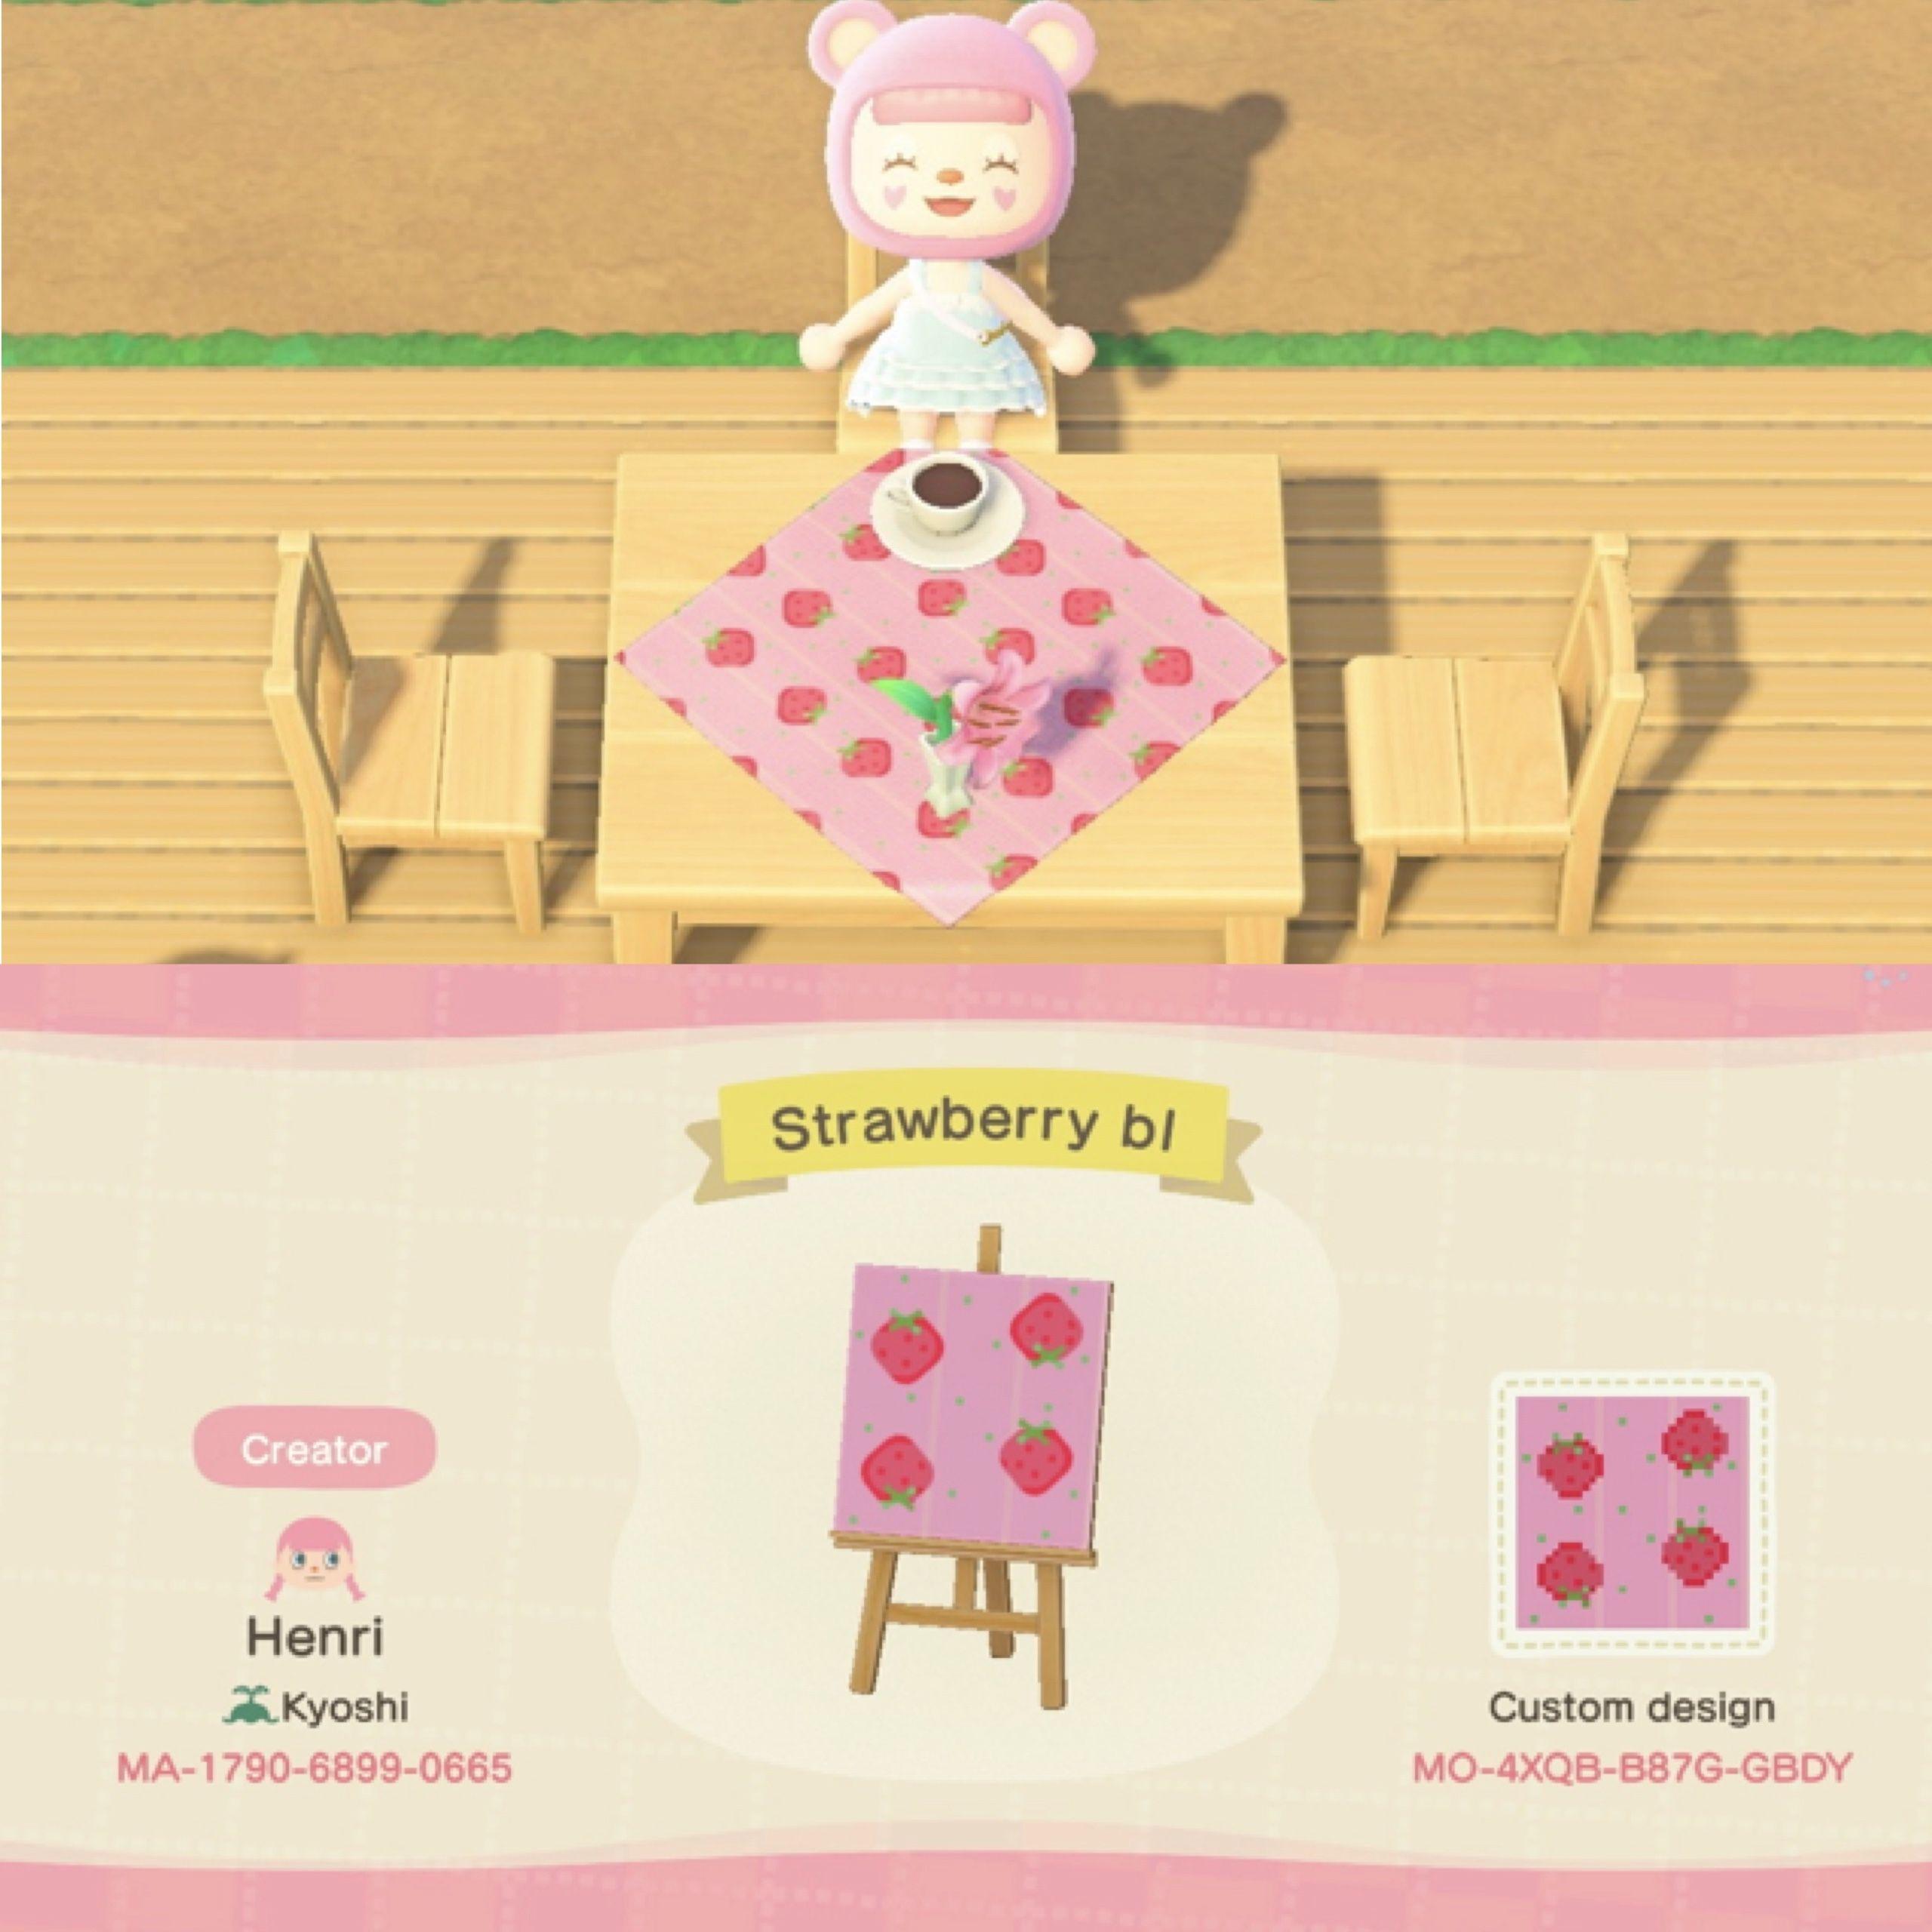 10++ Animal crossing strawberry dress ideas in 2021